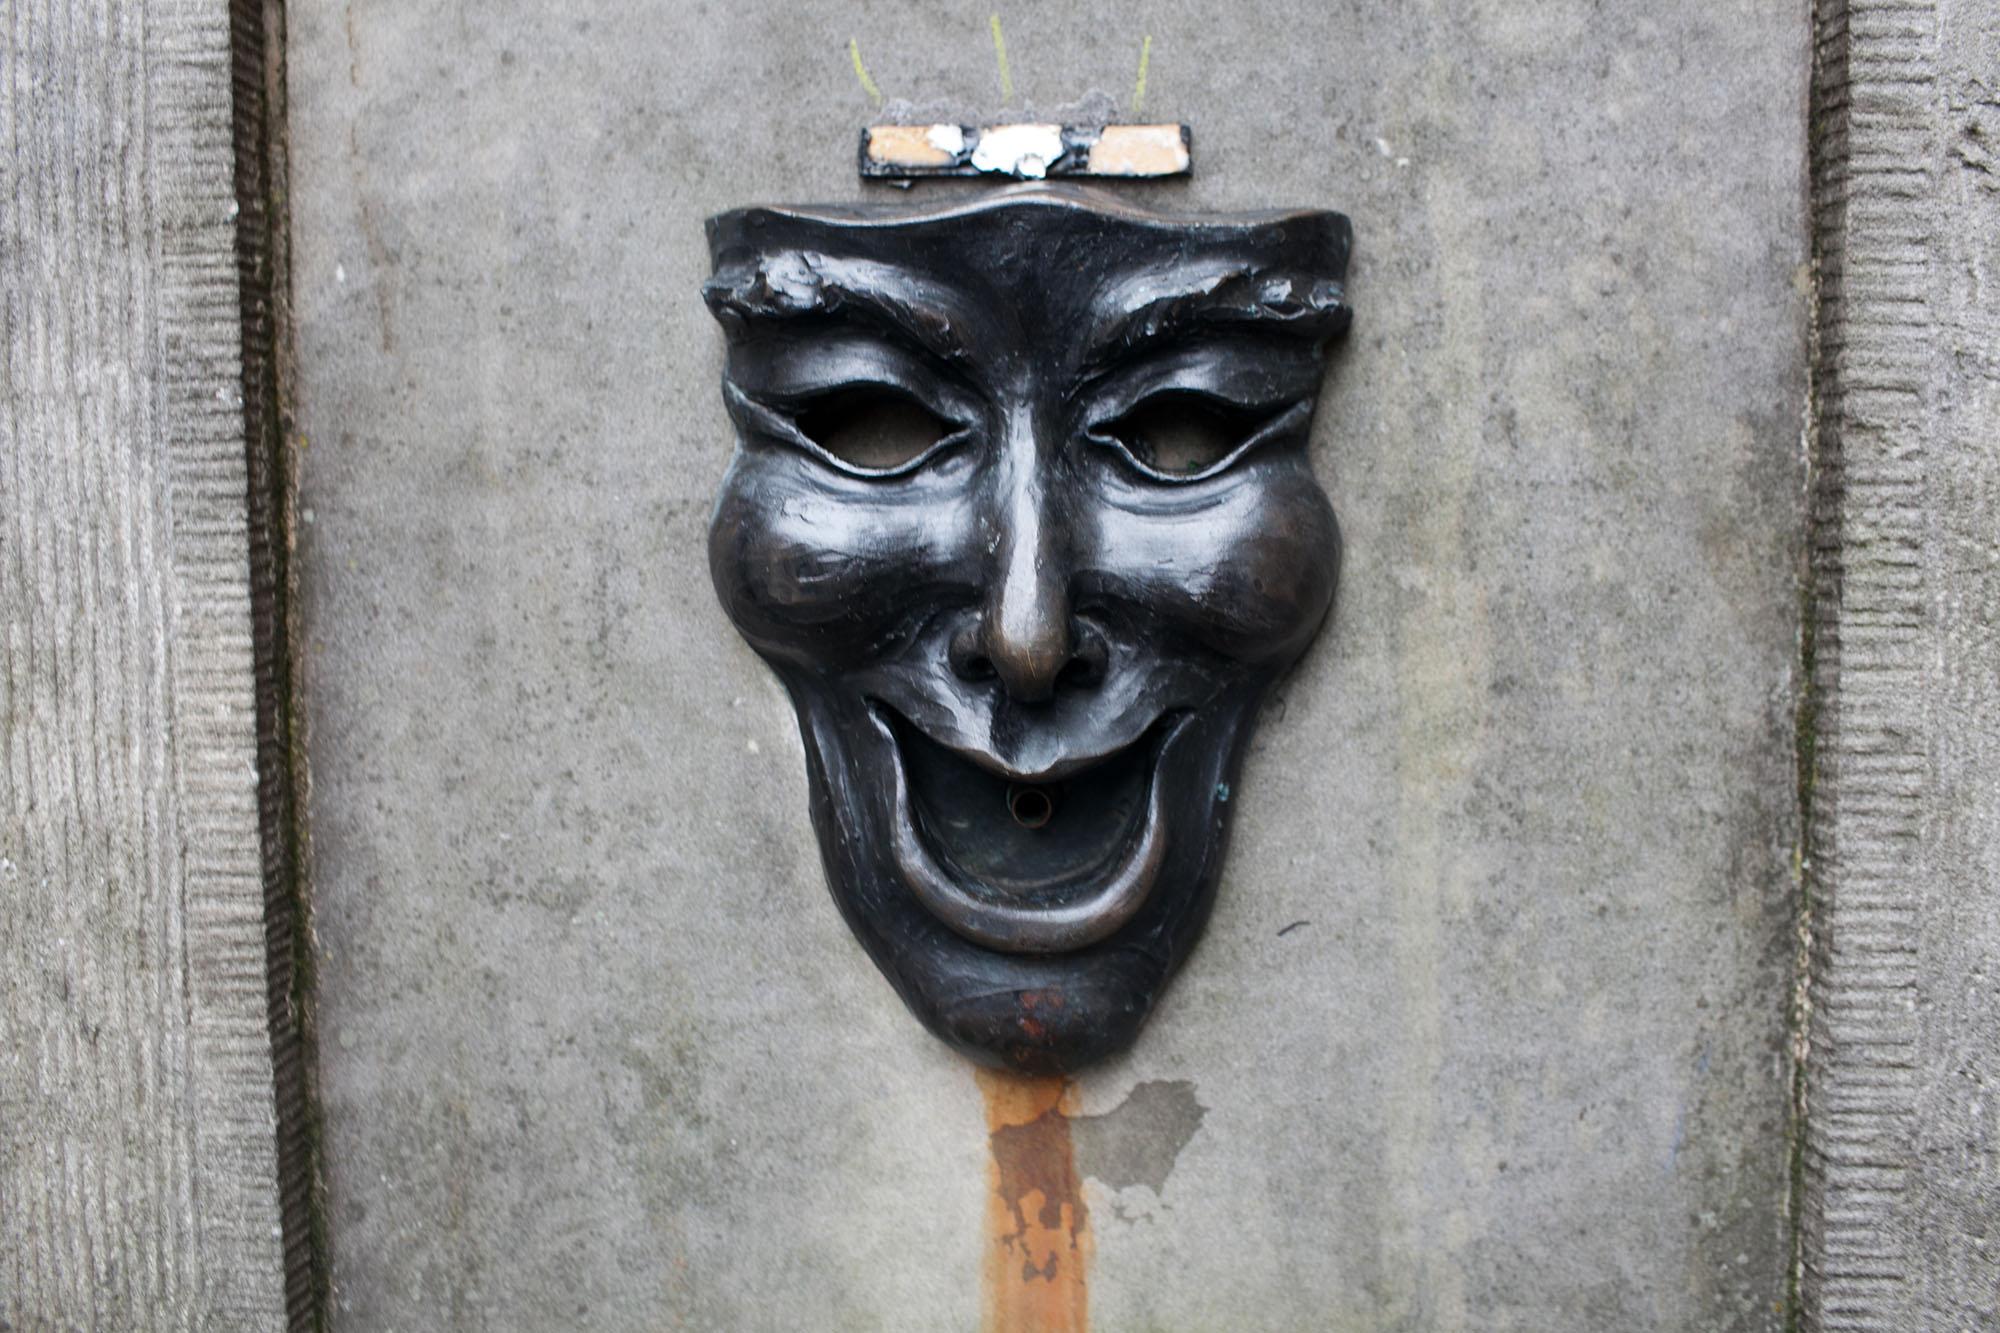 Comedy Mask on a post in Edinburgh, Scotland